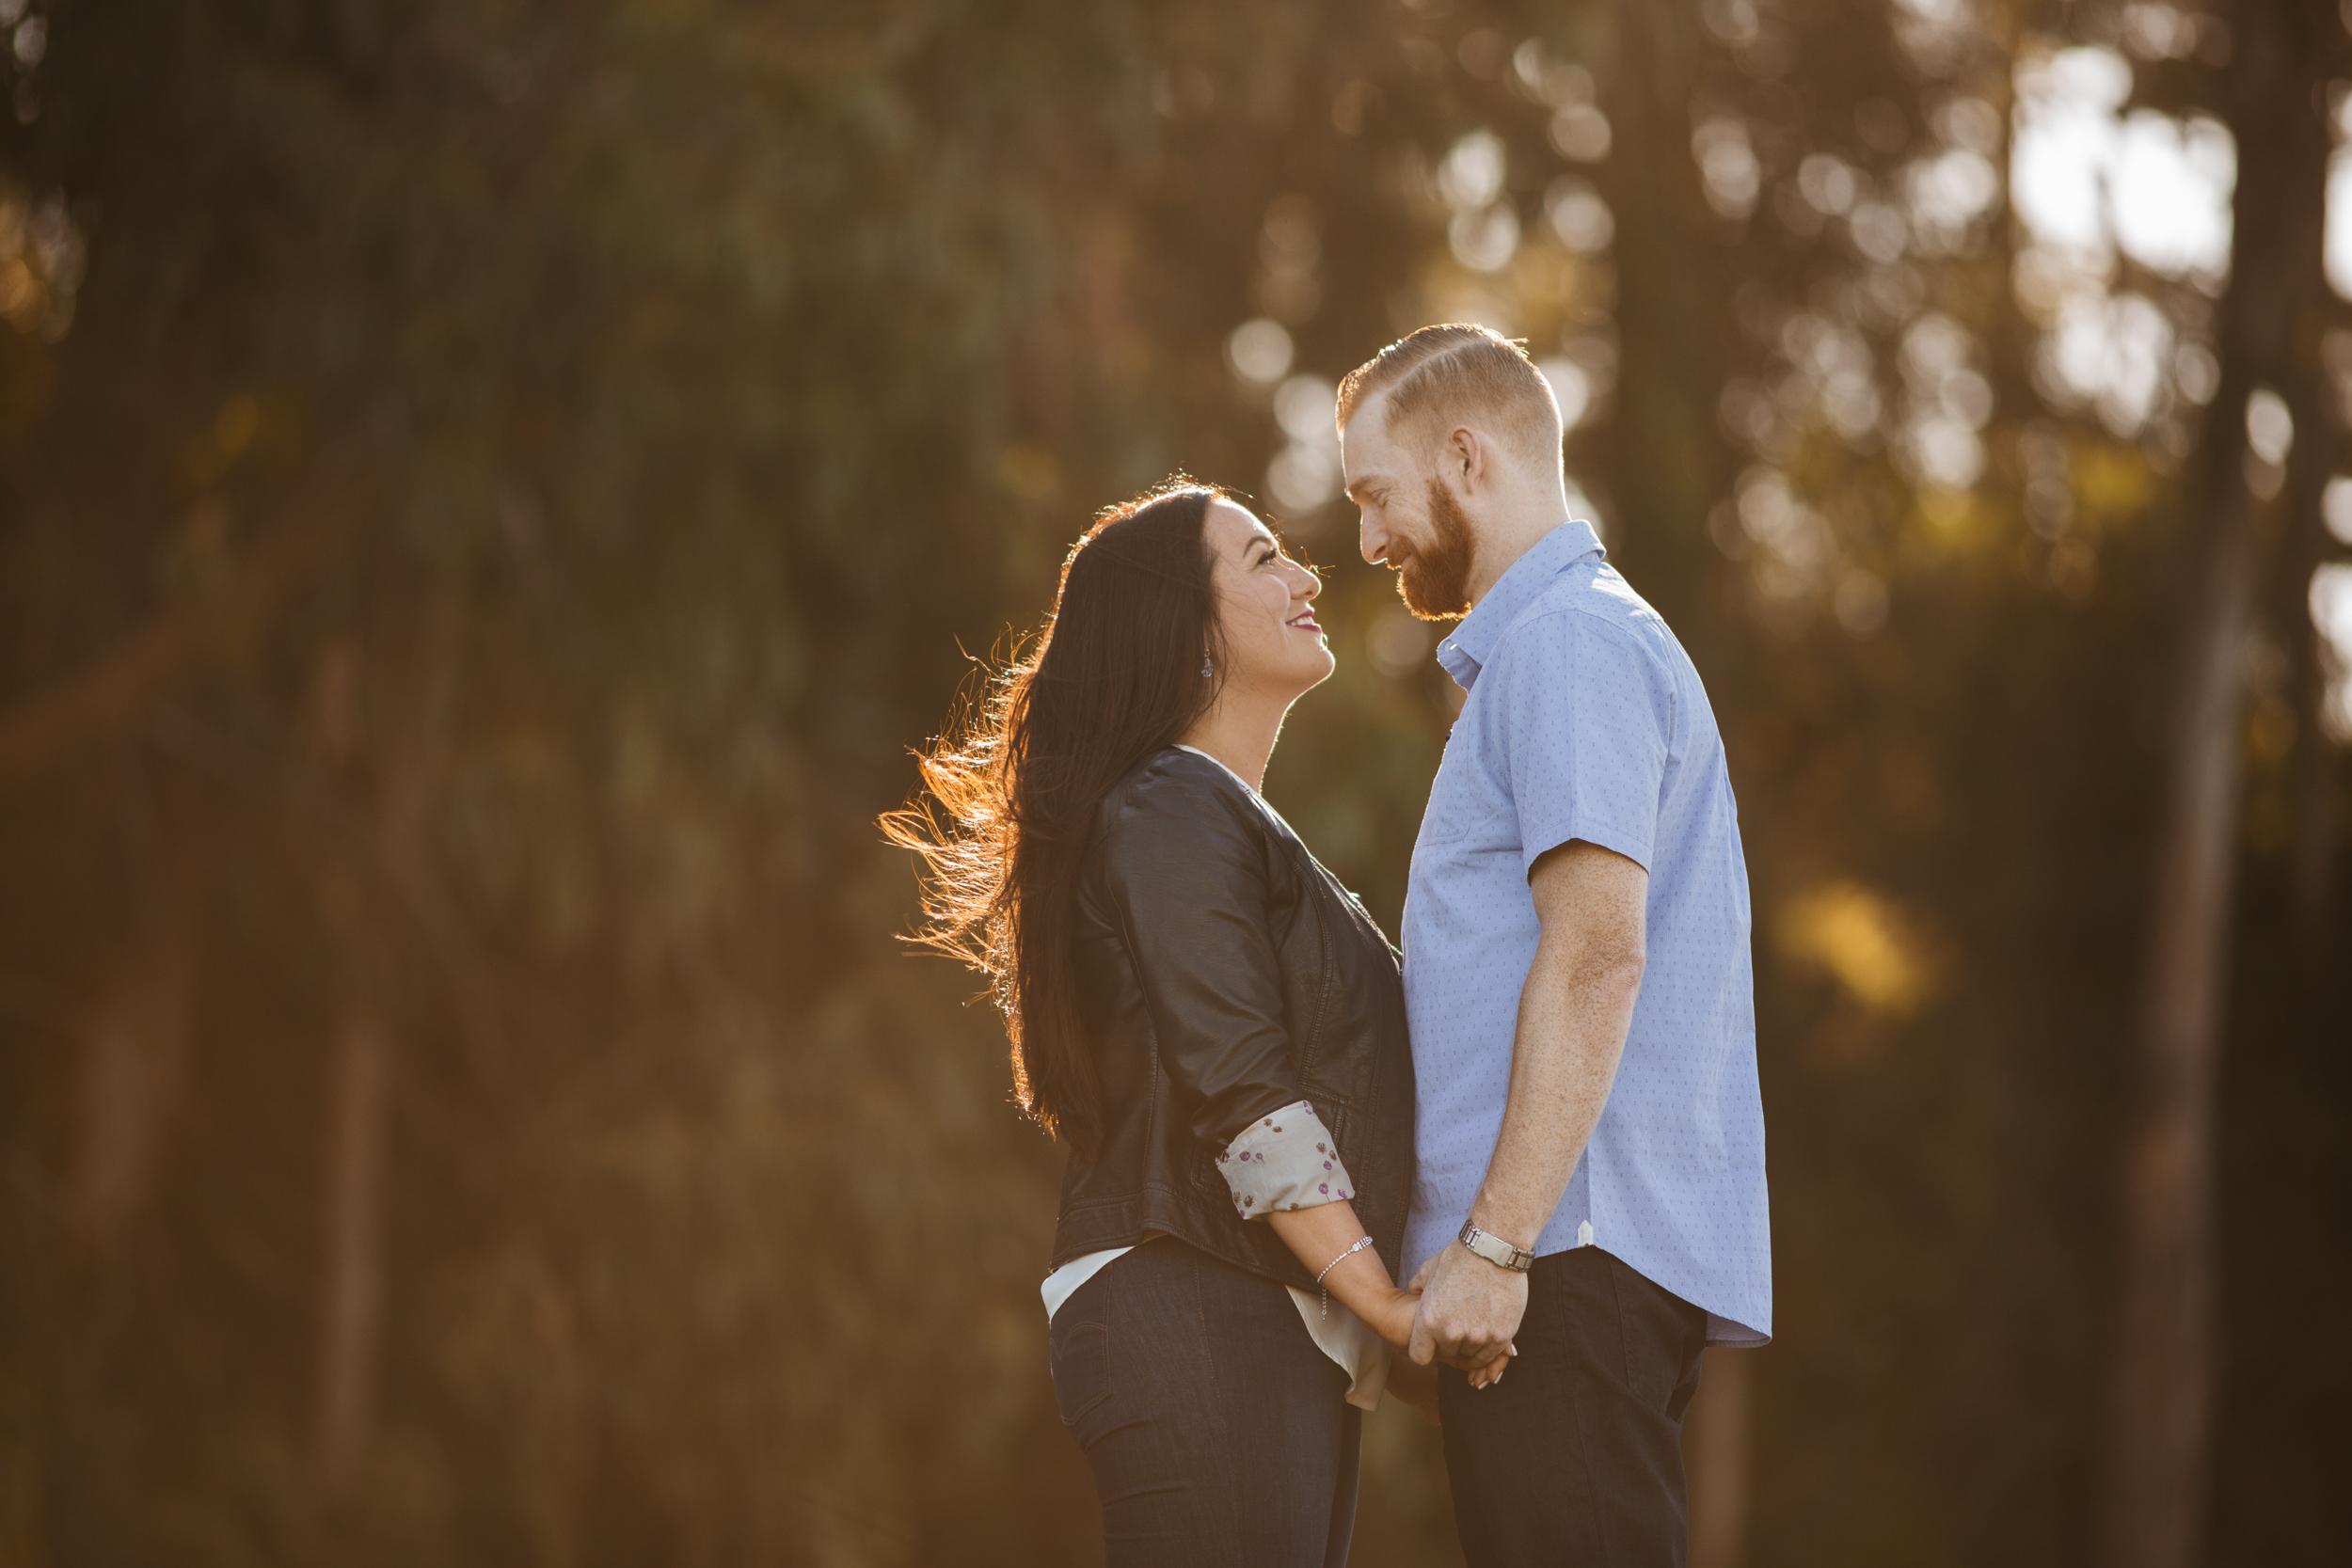 Engagement Photos-San Fransisco-Golden Gate Park-Ranalla Photo & Films-7.jpg